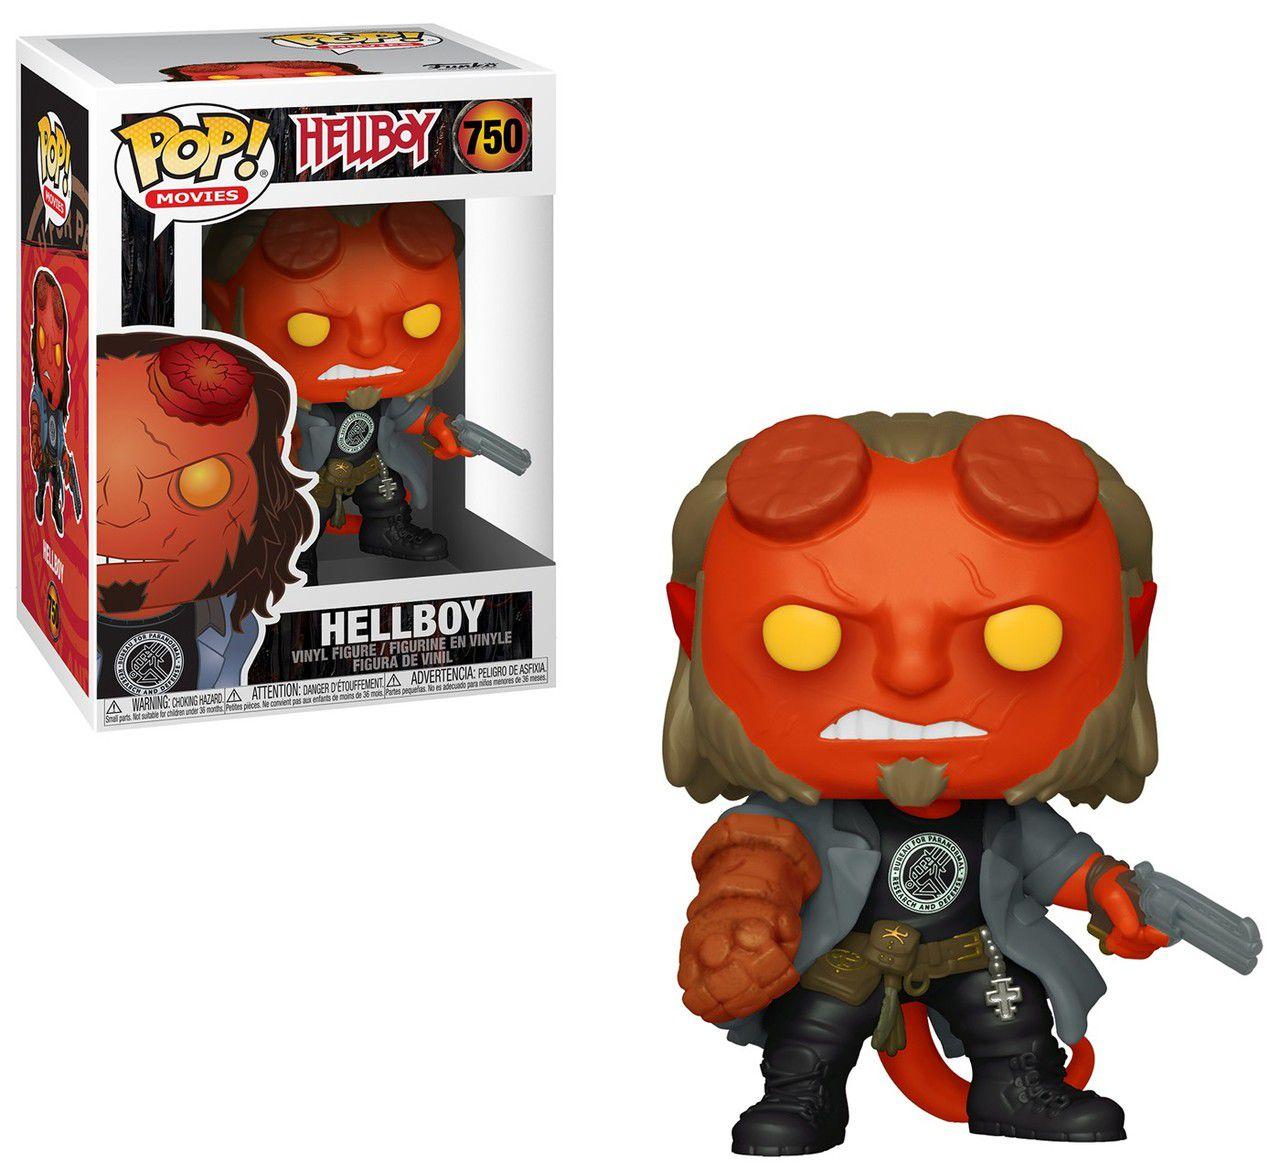 Hellboy #750 - Funko Pop! Movies